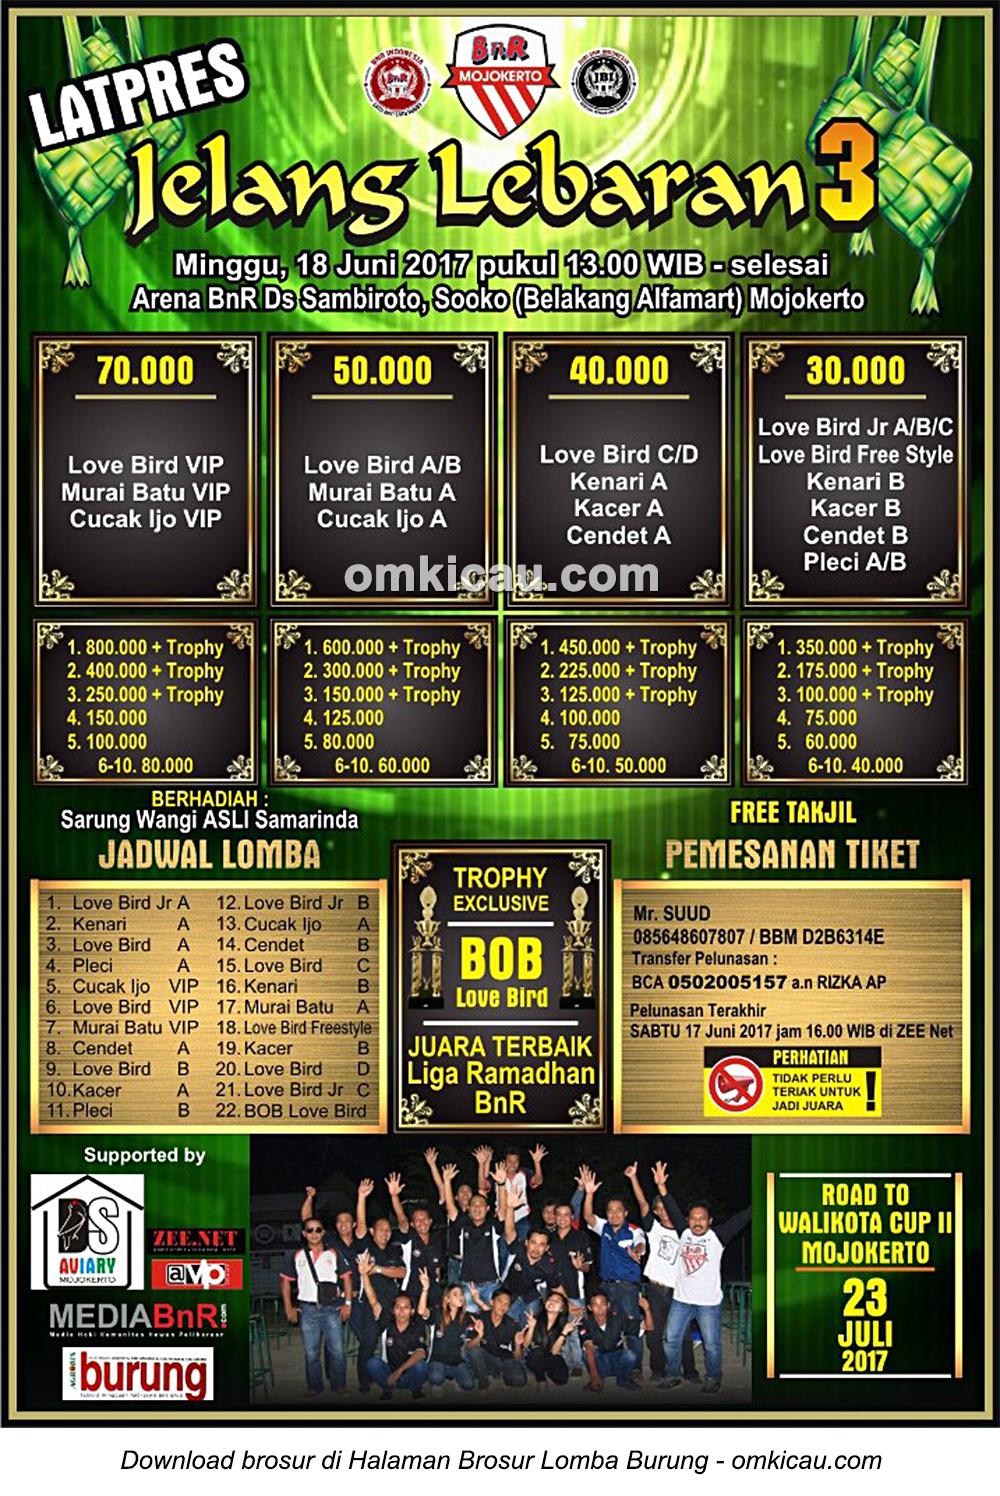 Brosur Latpres Jelang Lebaran 3 BnR Mojokerto, 18 Juni 2017